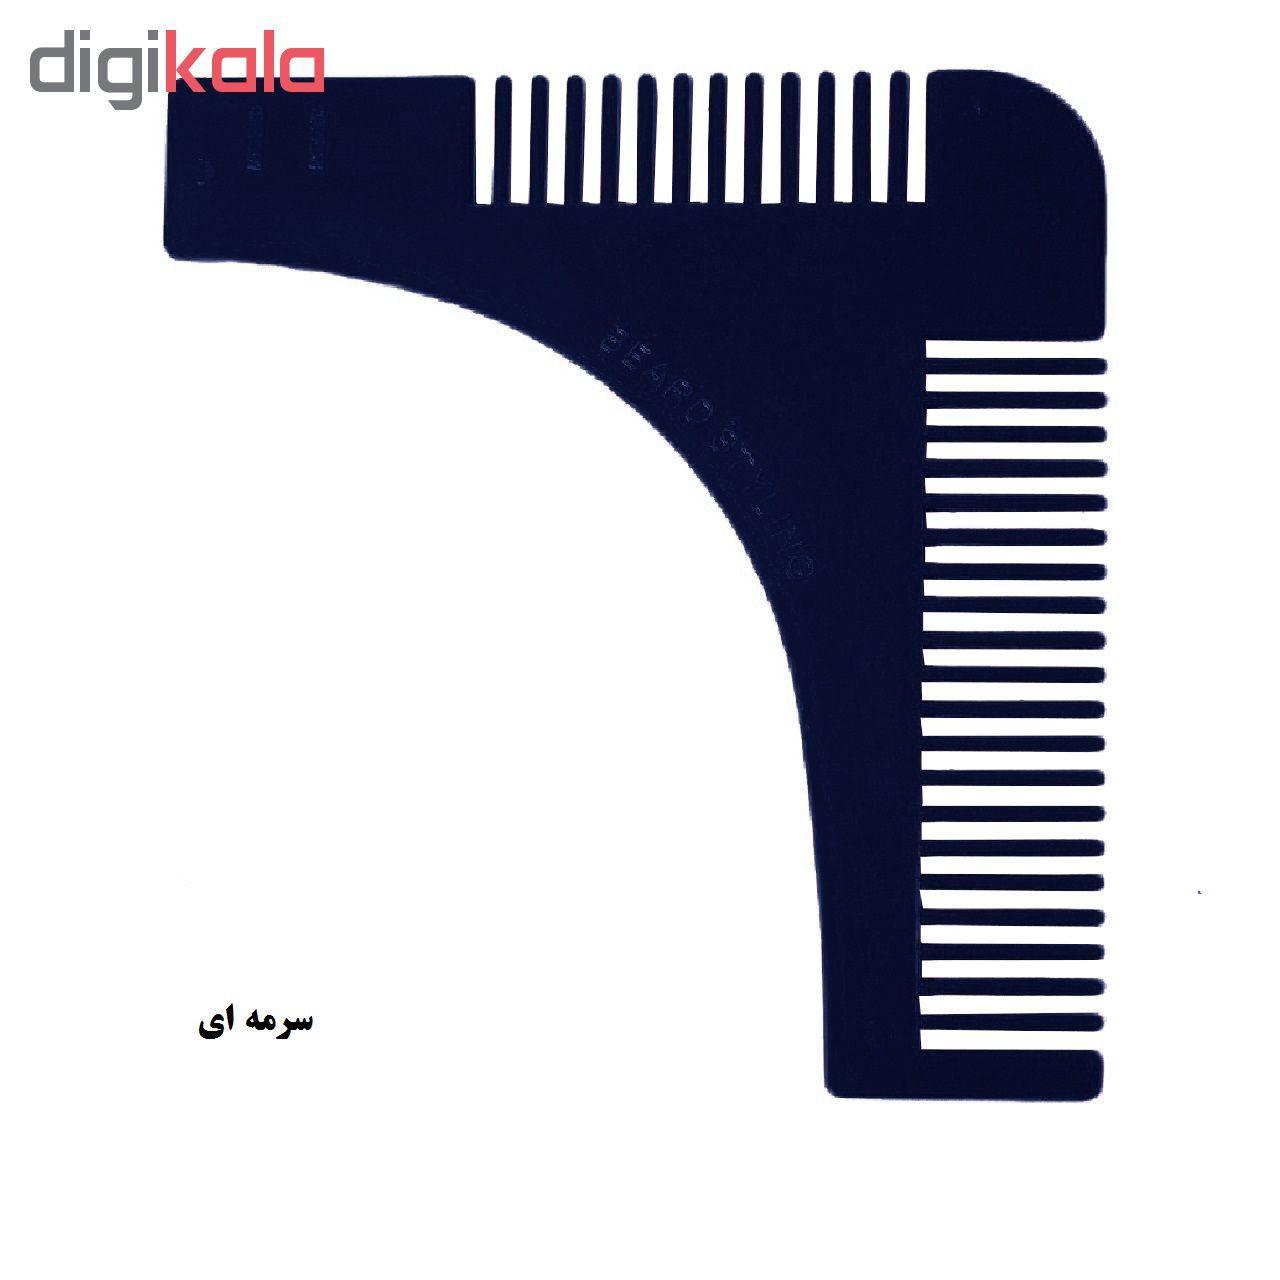 شانه اصلاح ریش مدل Beard Styling main 1 1